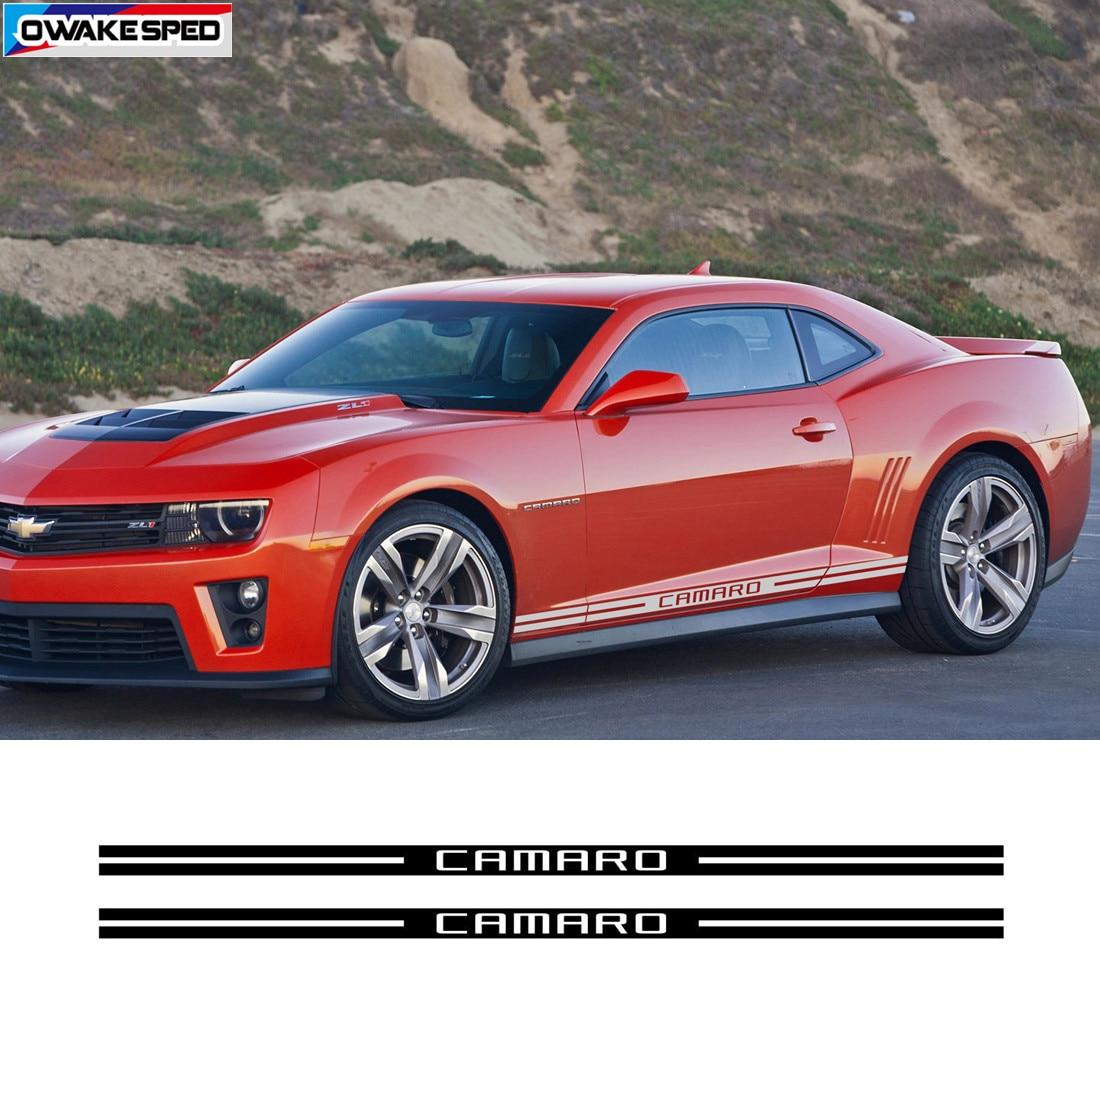 Graphics Racing Line Sticker Car Side Decal for Chevrolet Corvette Camaro.